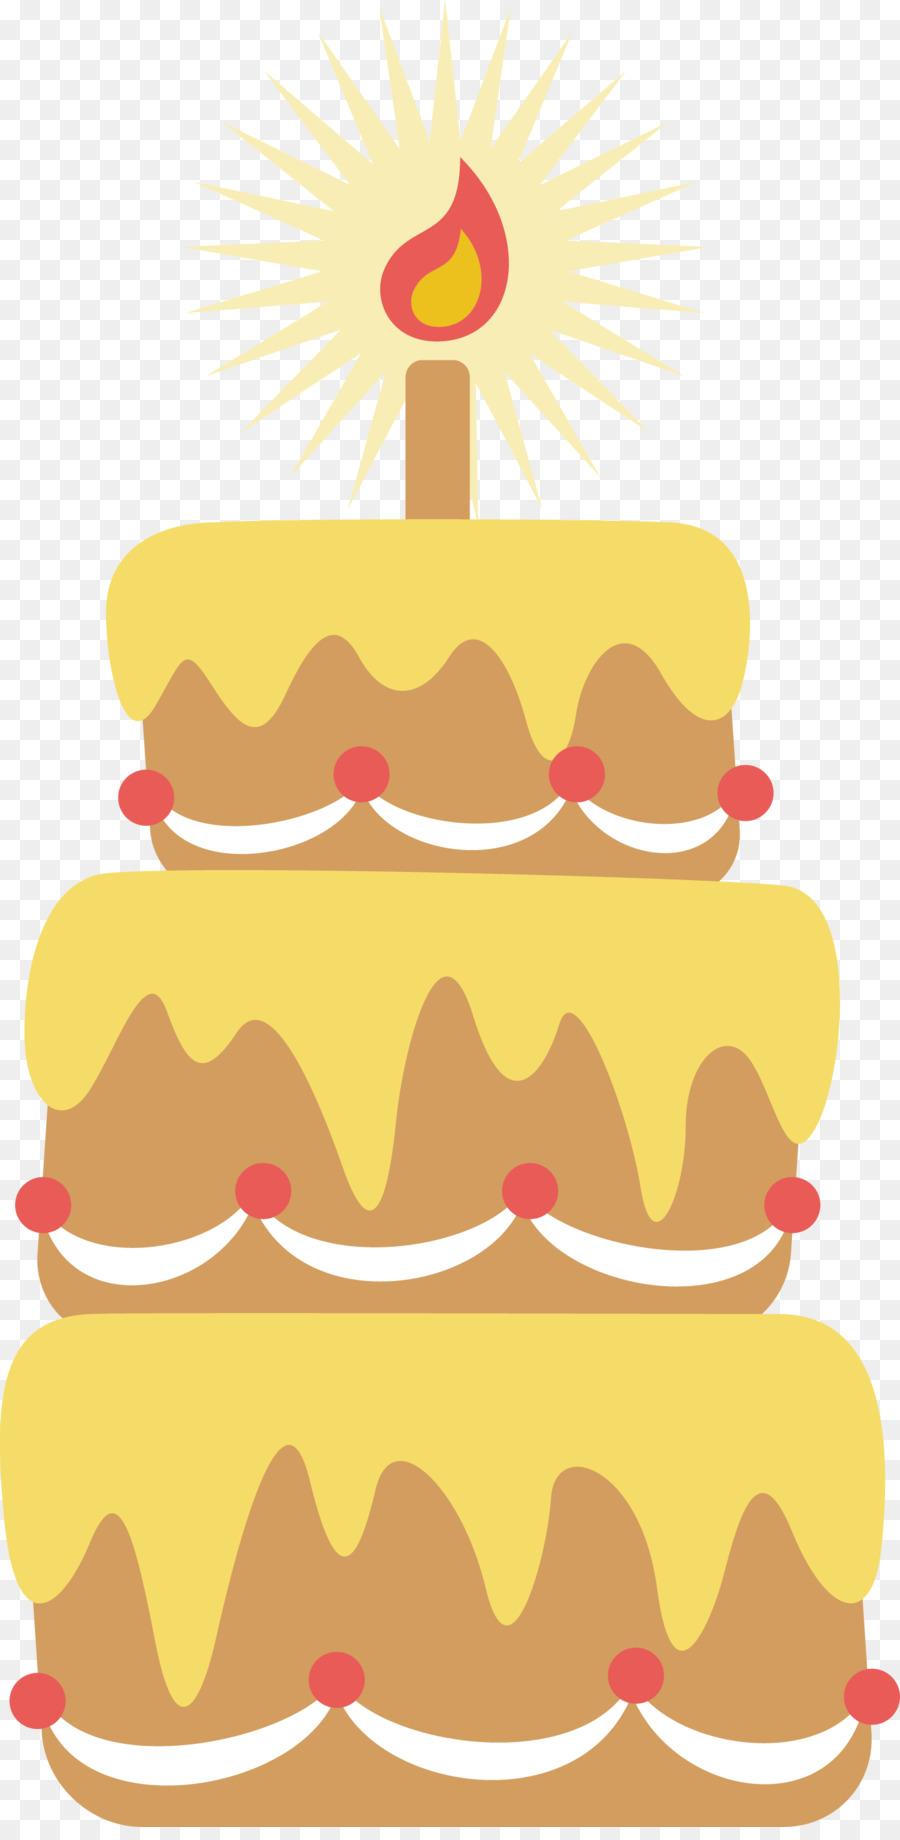 Wedding cake Birthday cake Torte Chocolate cake Layer cake - Vector ...